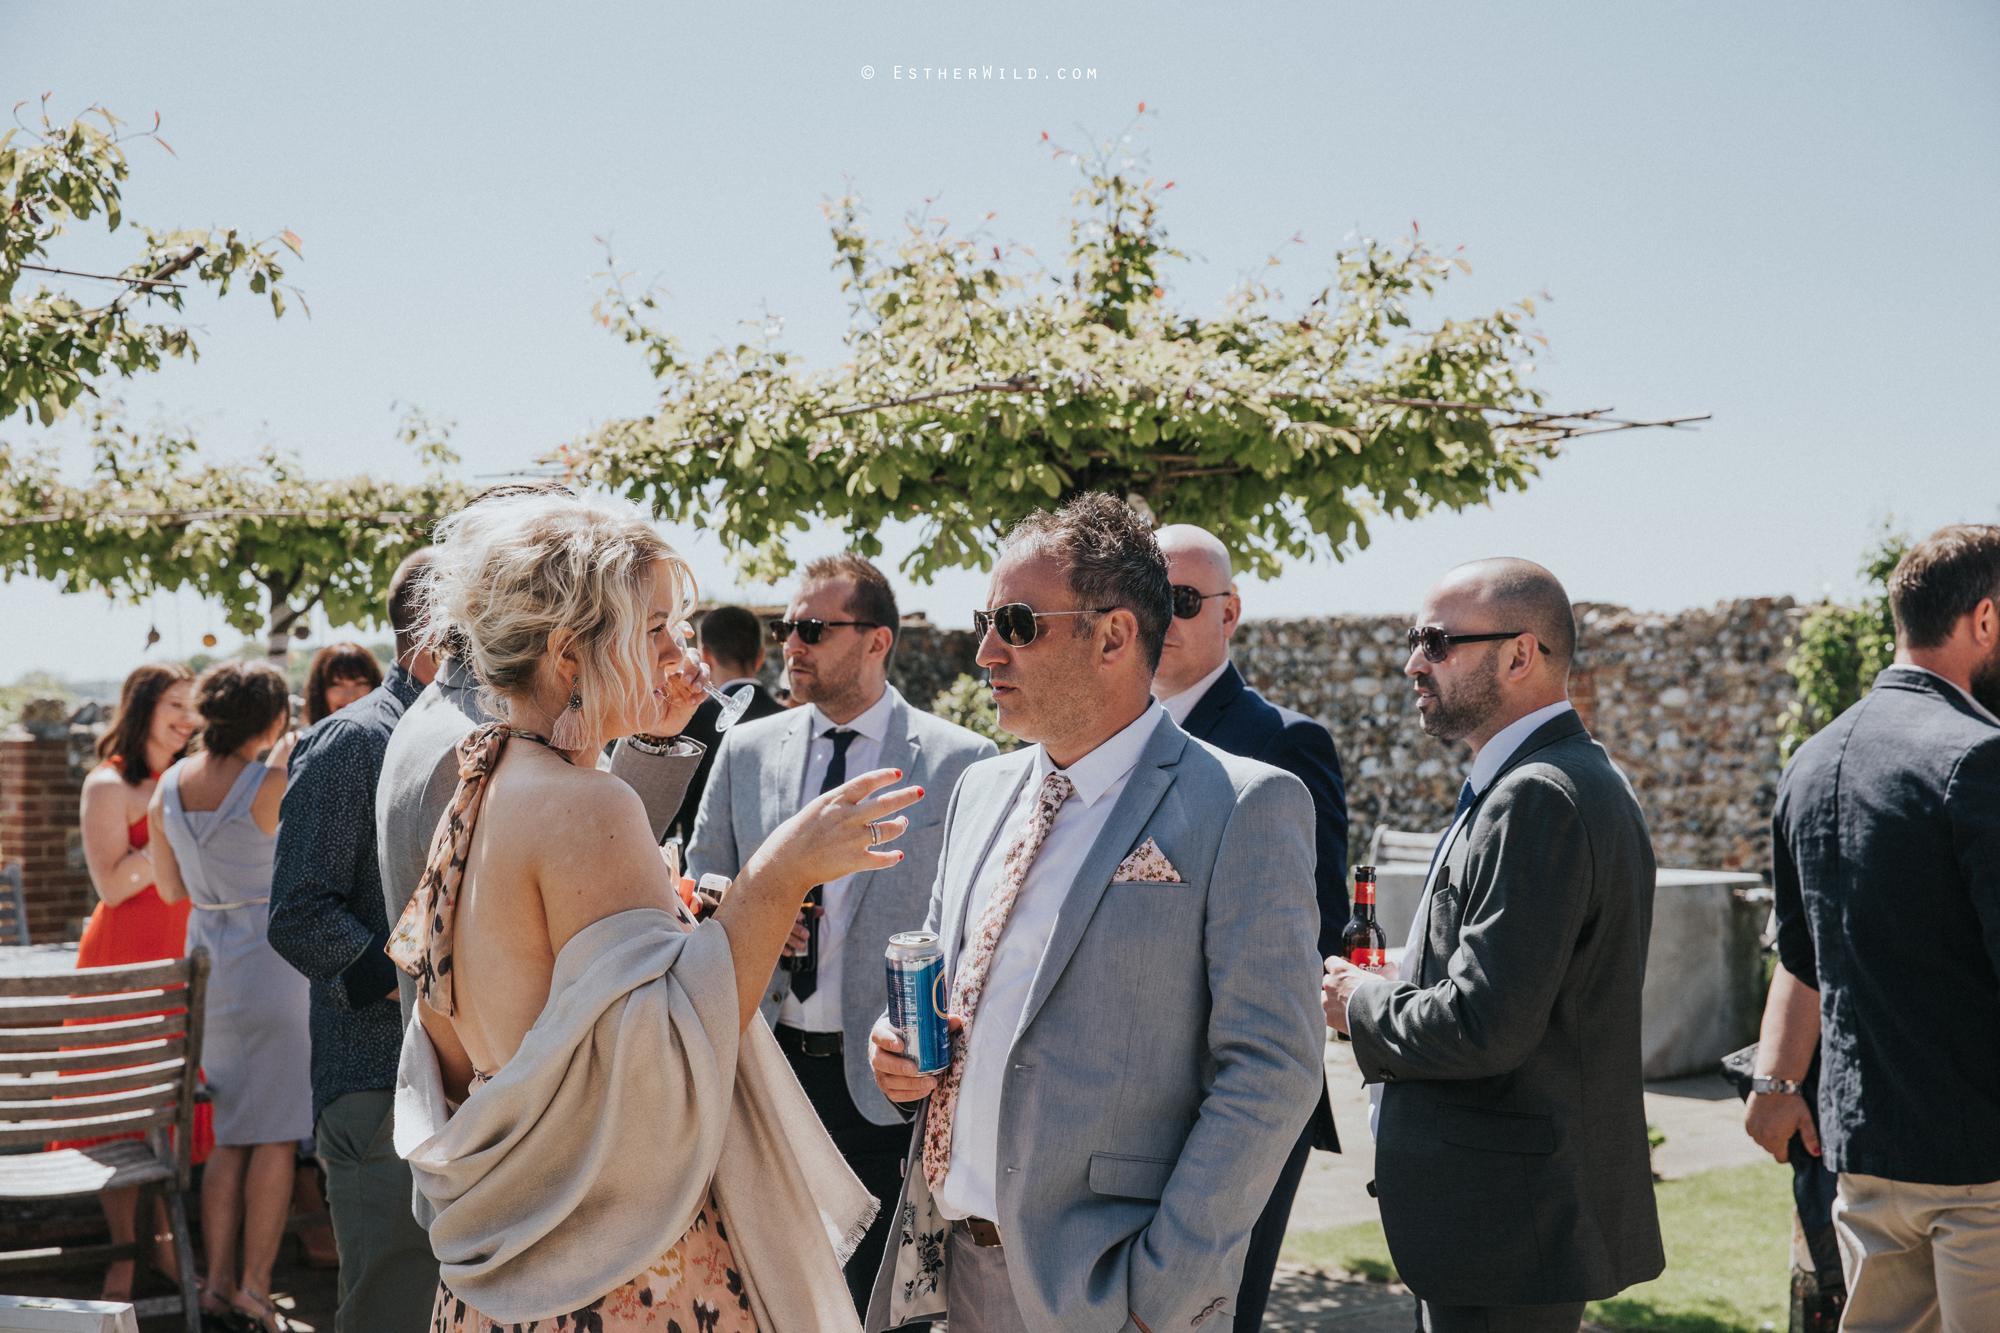 IMG_0416Cley_Barn_Drift_Norfolk_Coast_Wedding_Copyright_Esther_Wild_Photographer_.jpg